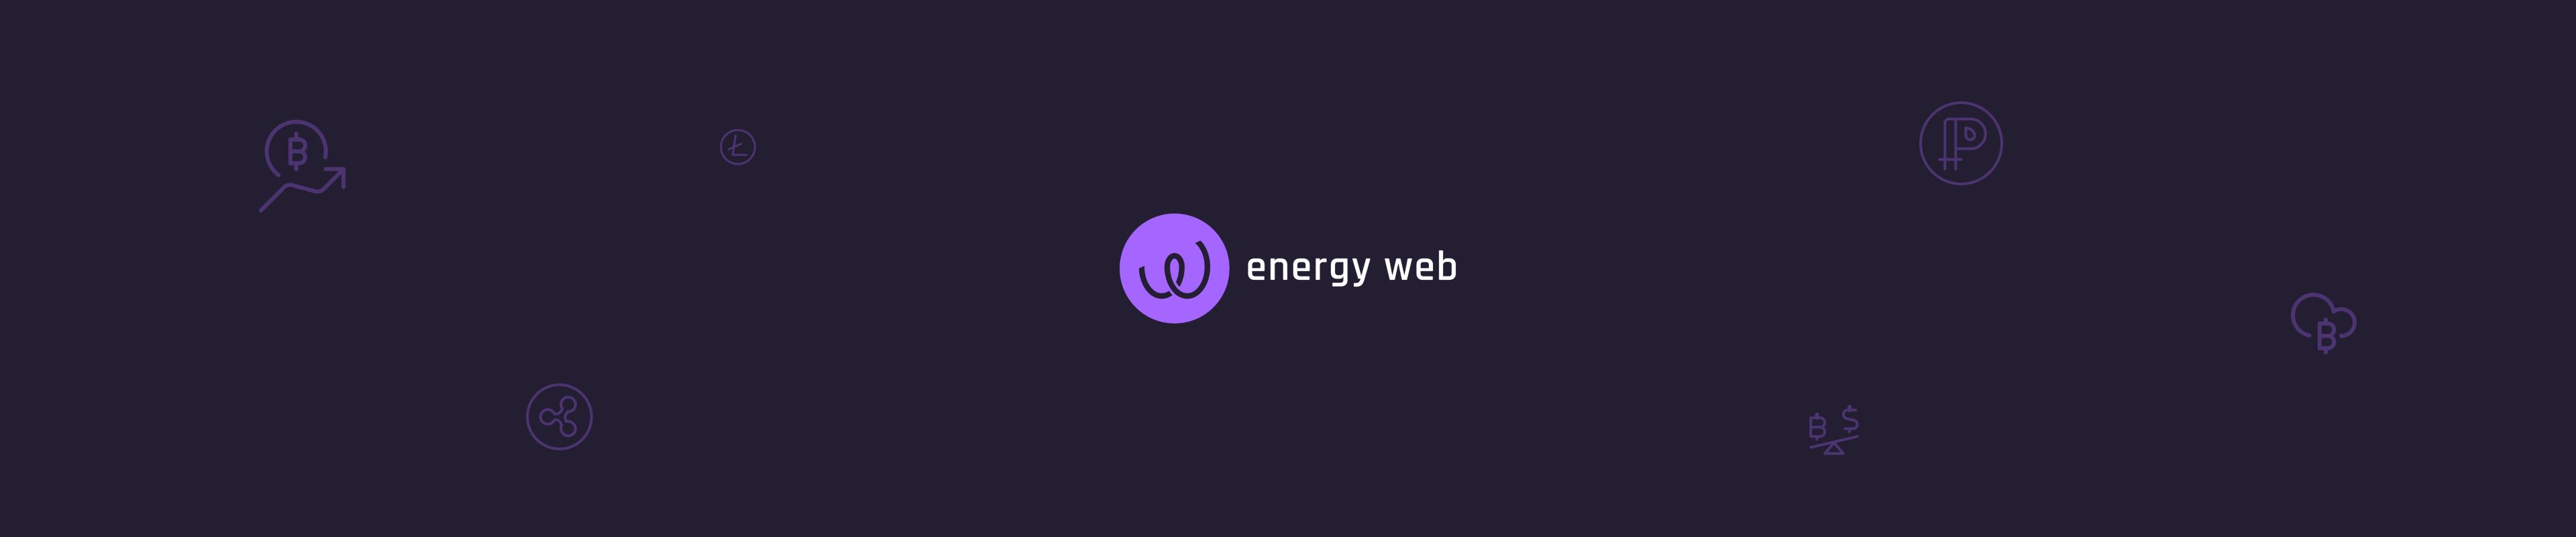 Case study of Energy Web